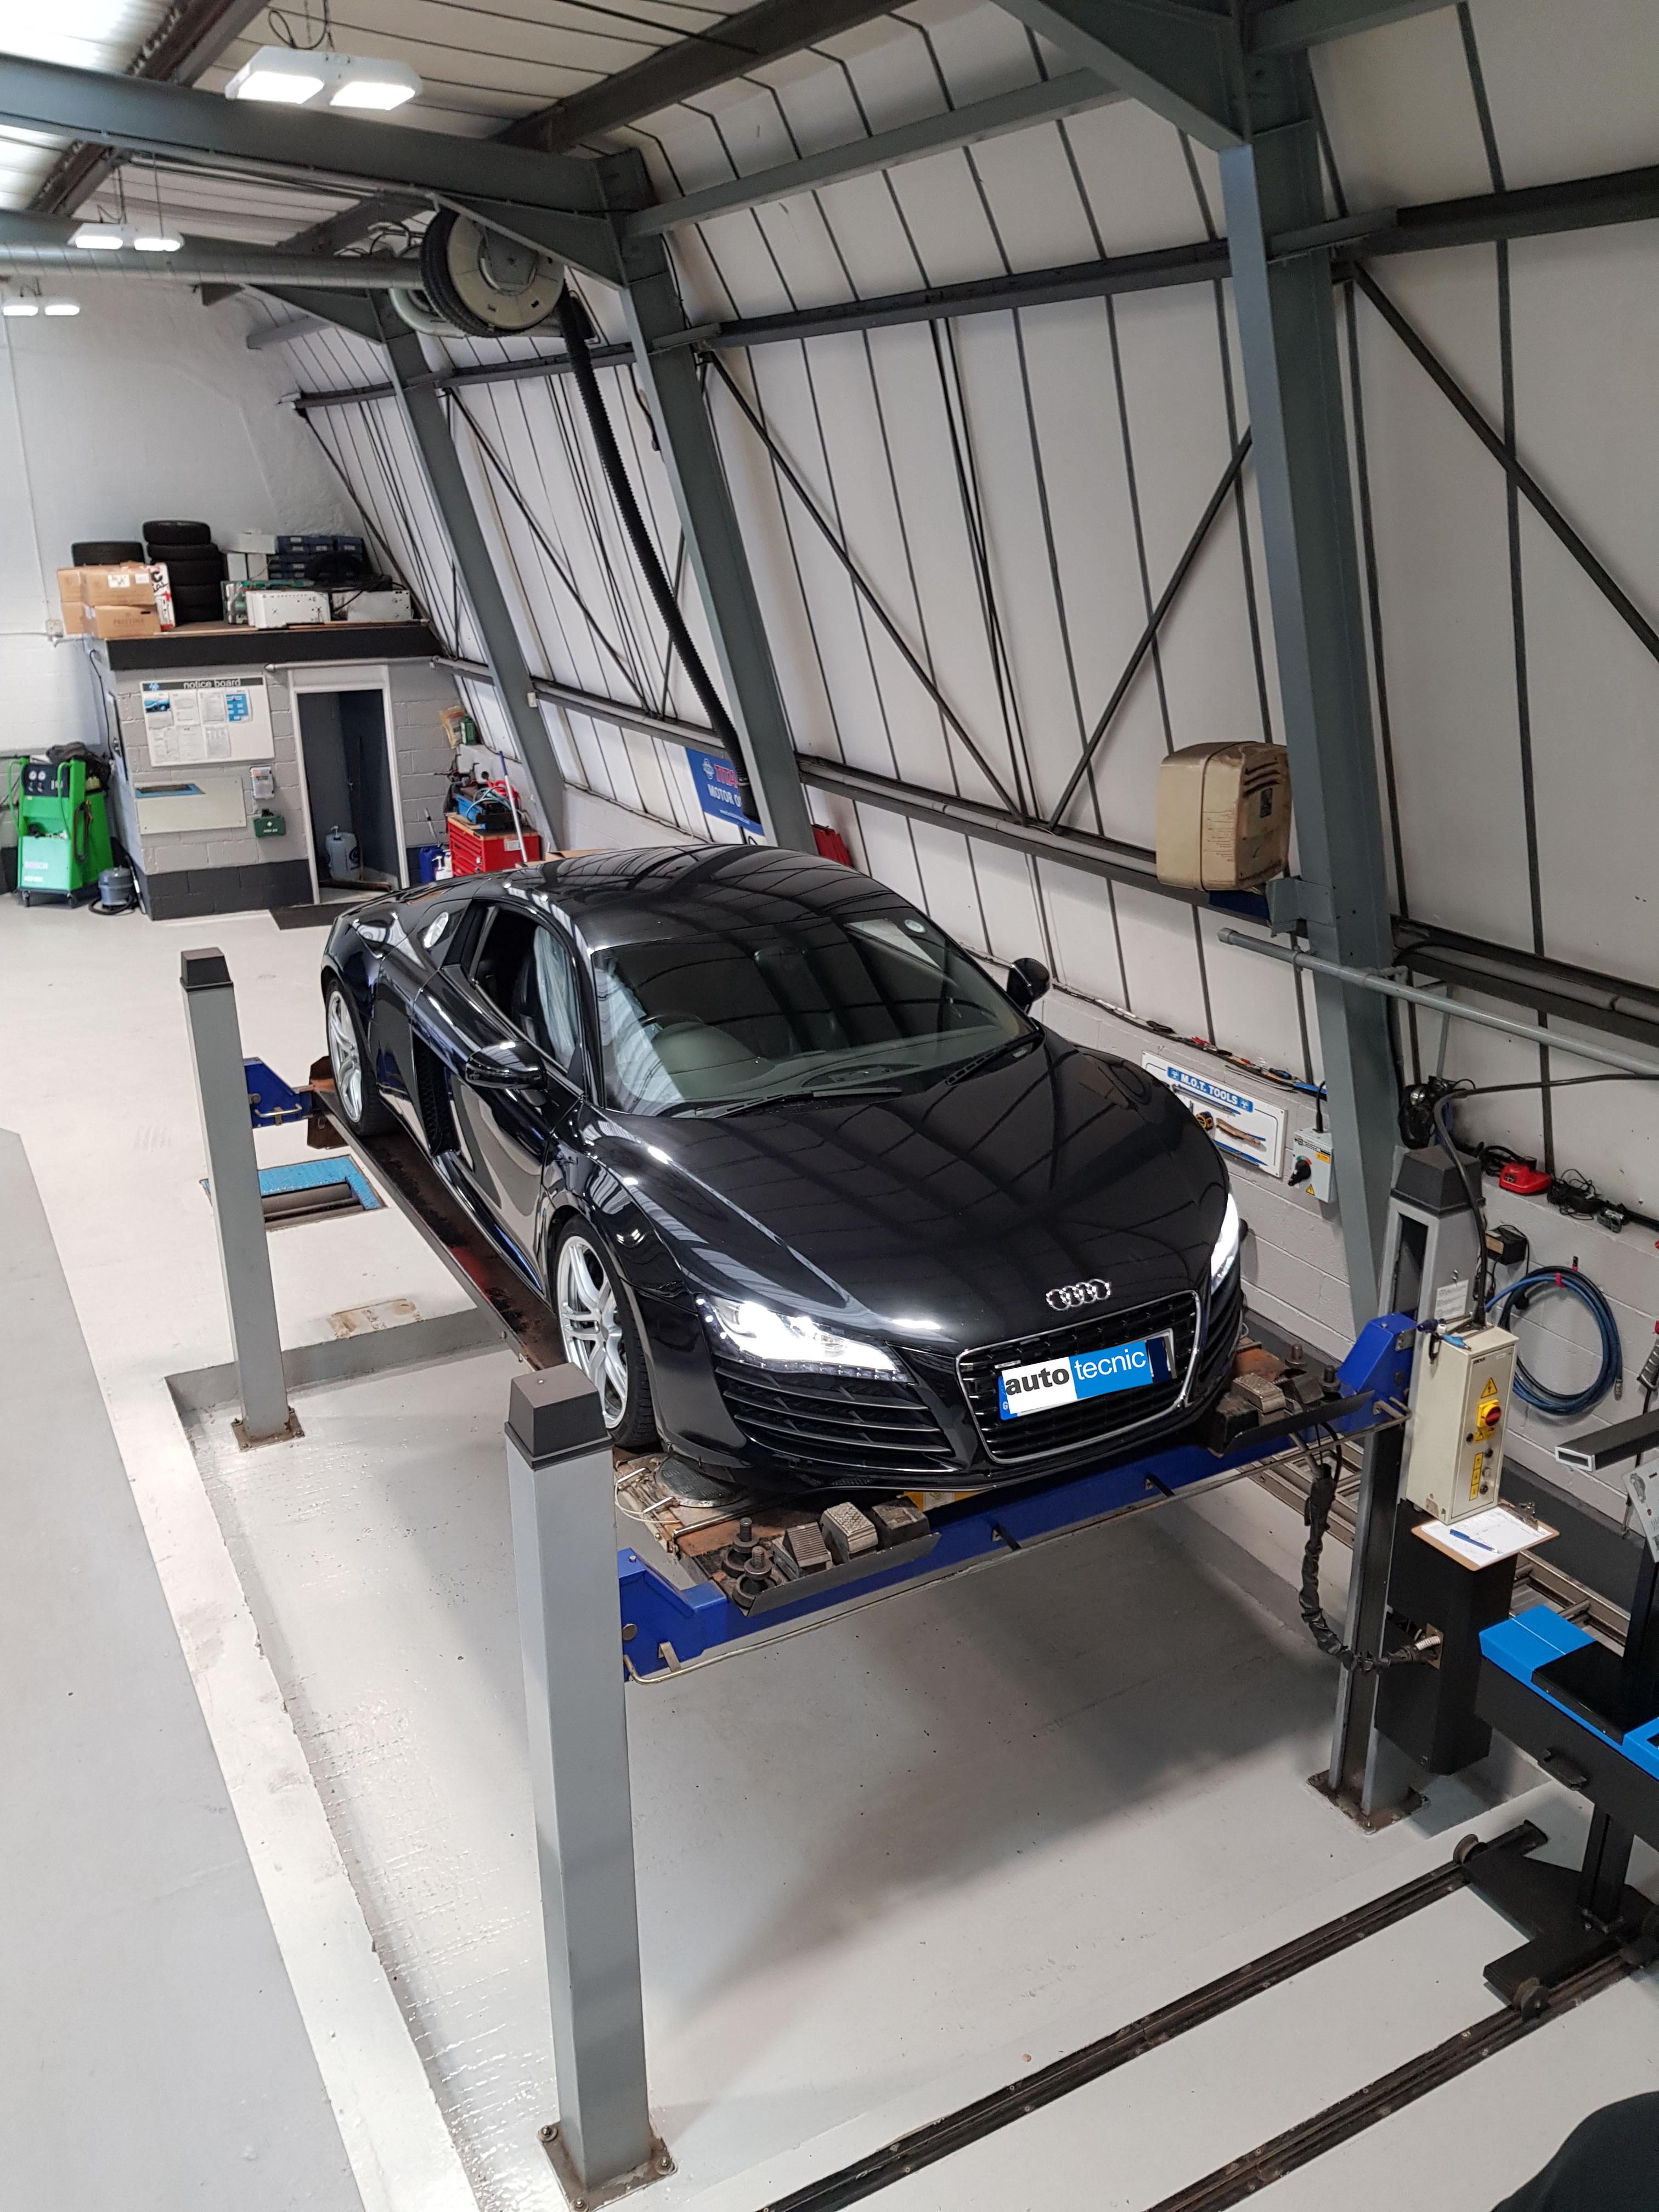 Autotecnic Sheffield - Audi R8